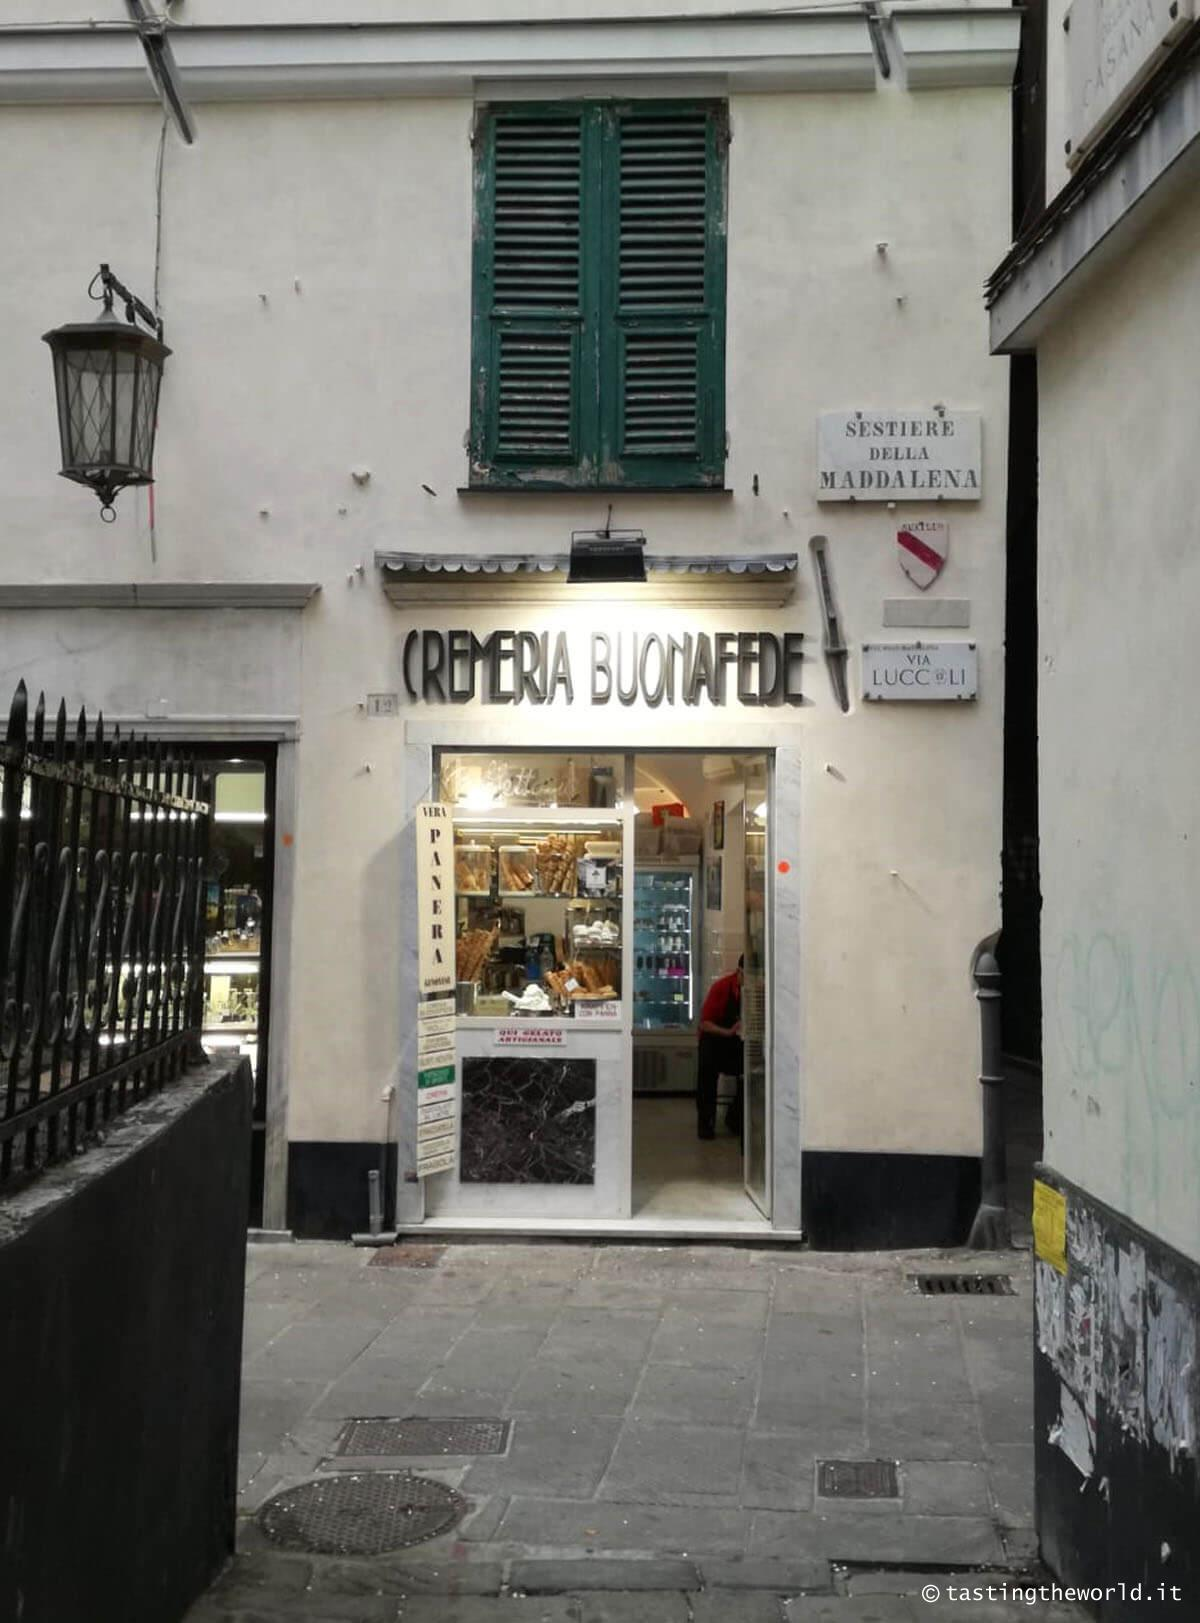 Cremeria Buonafede - Genova